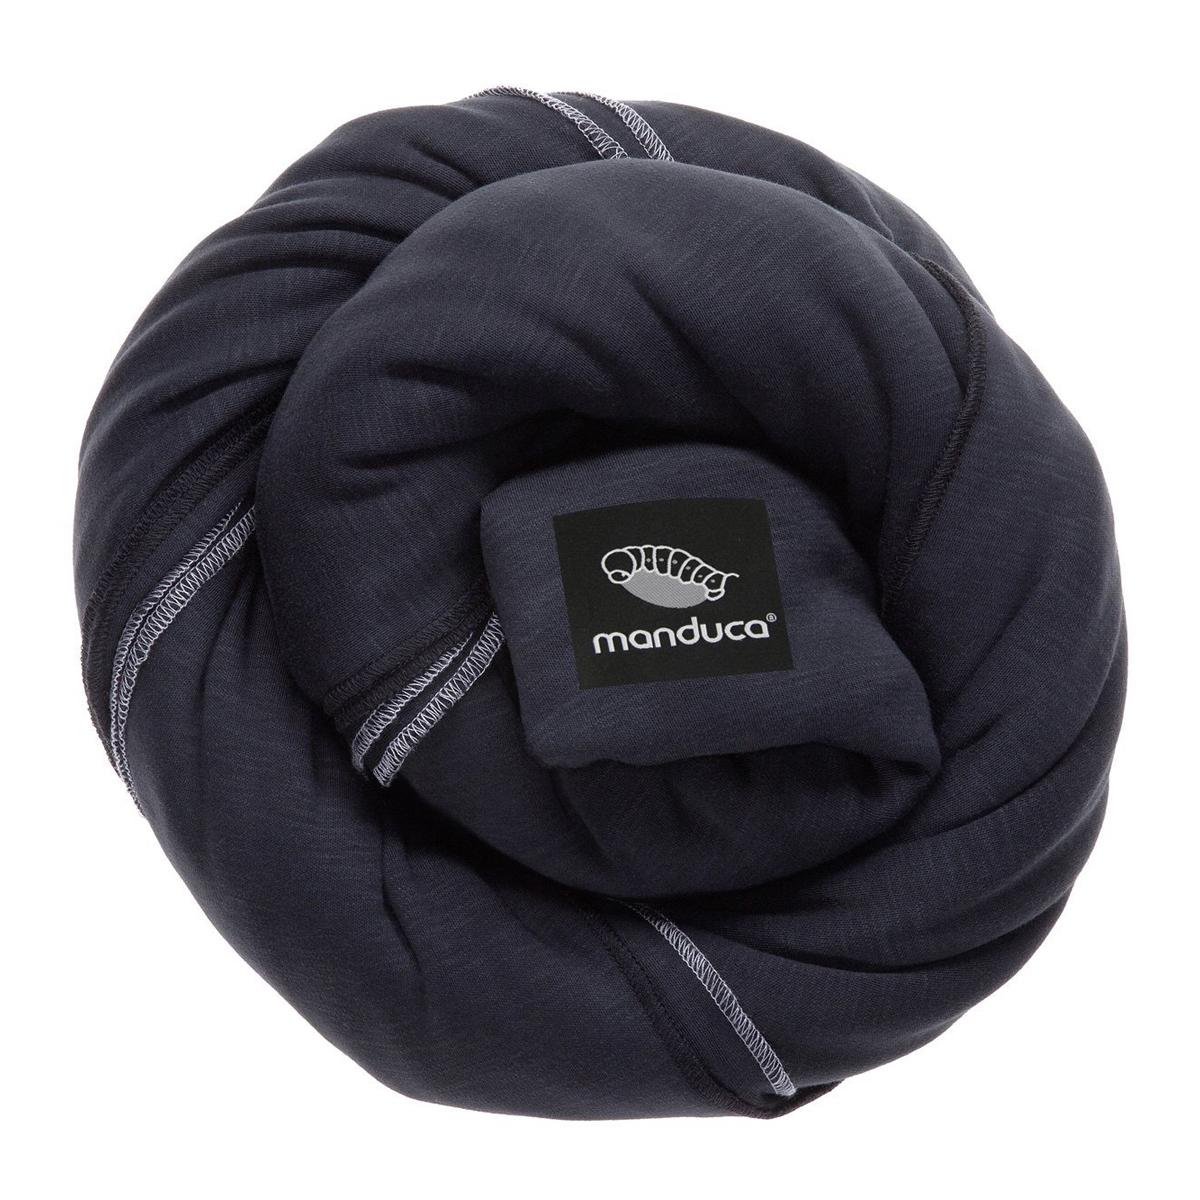 Porte bébé Echarpe de Portage Sling - Noir Echarpe de Portage Sling - Noir